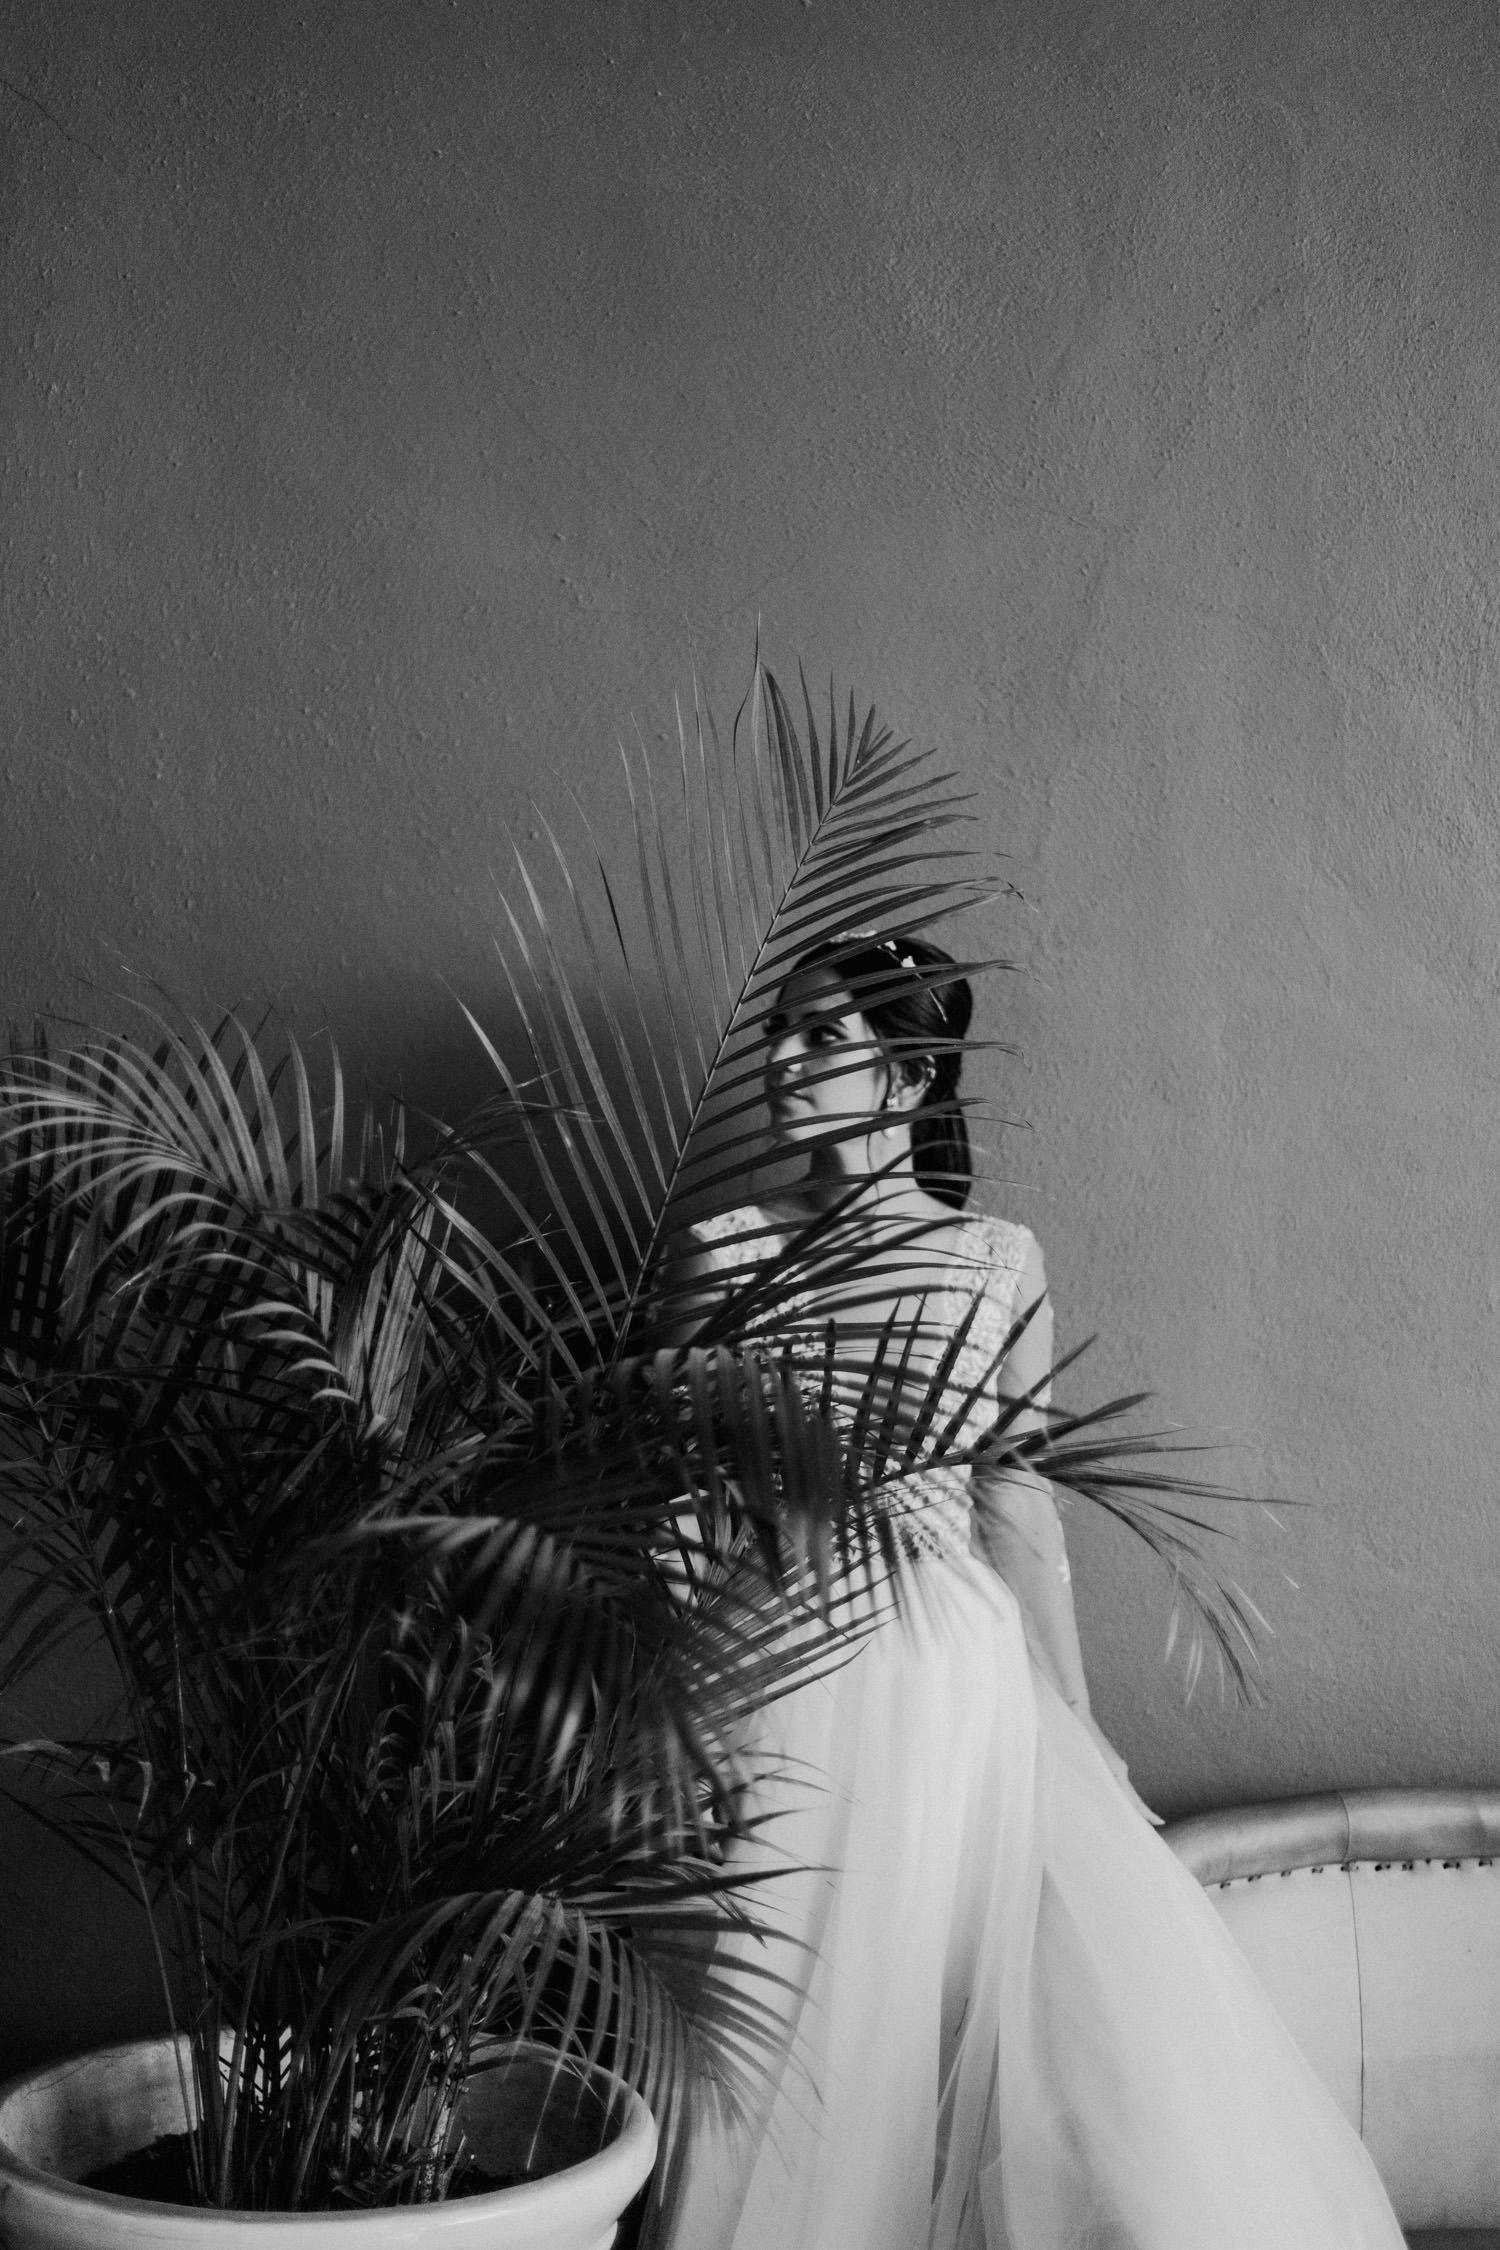 Boda-Guanajuato-Fotografo-Antigua-Hacienda-Dolores-Barrera-Casandra-Rodrigo-Pierce-1-22.jpg